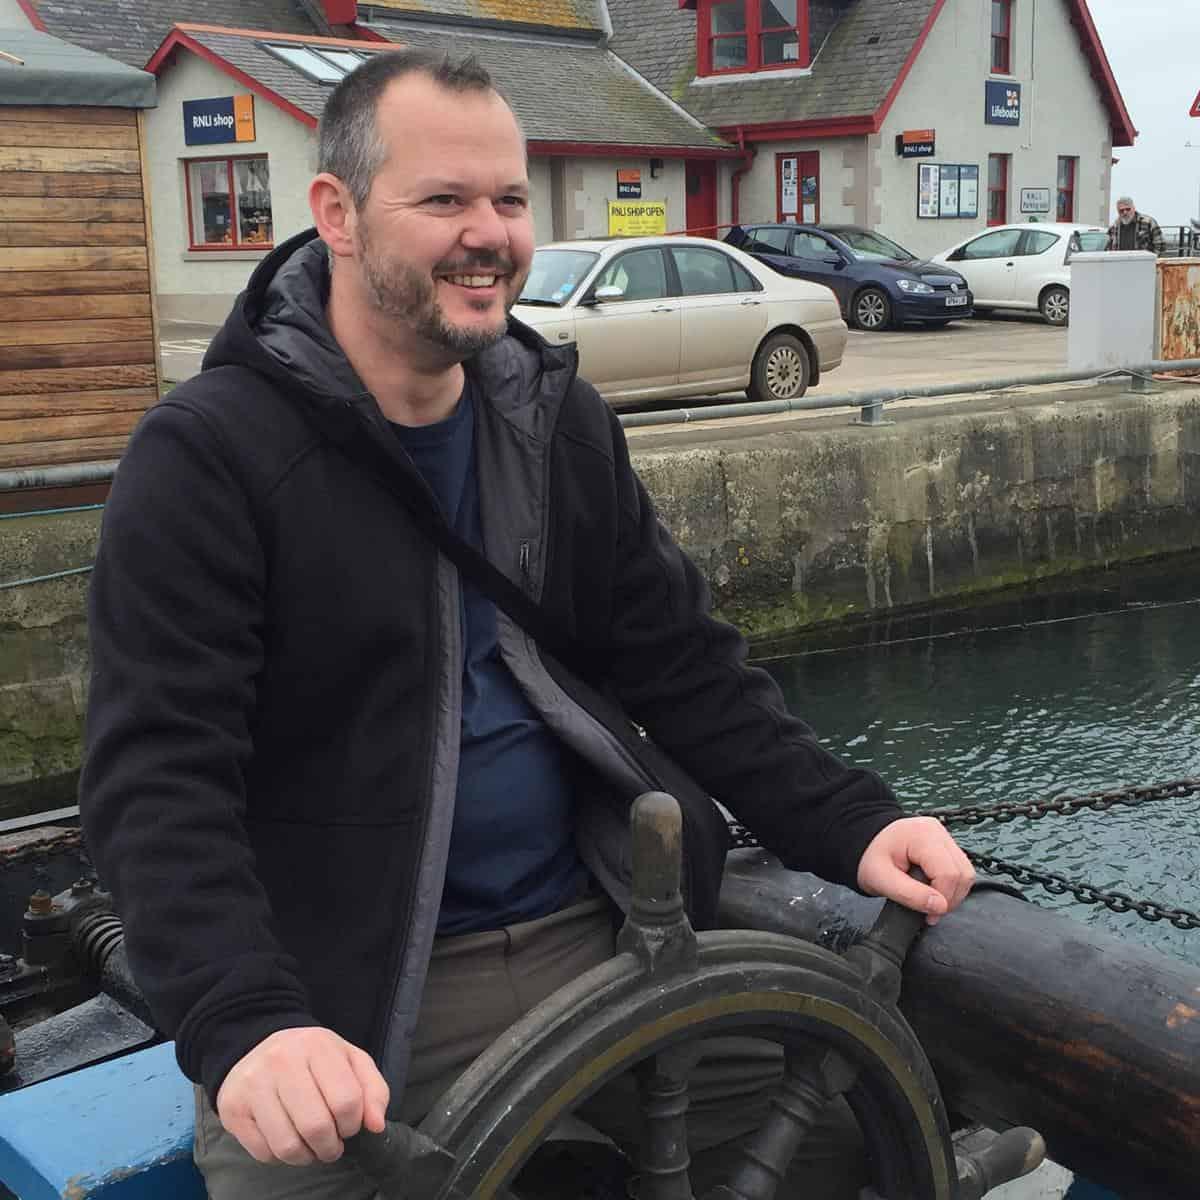 Hubert Mayer vom travellerblog.eu in Schottland